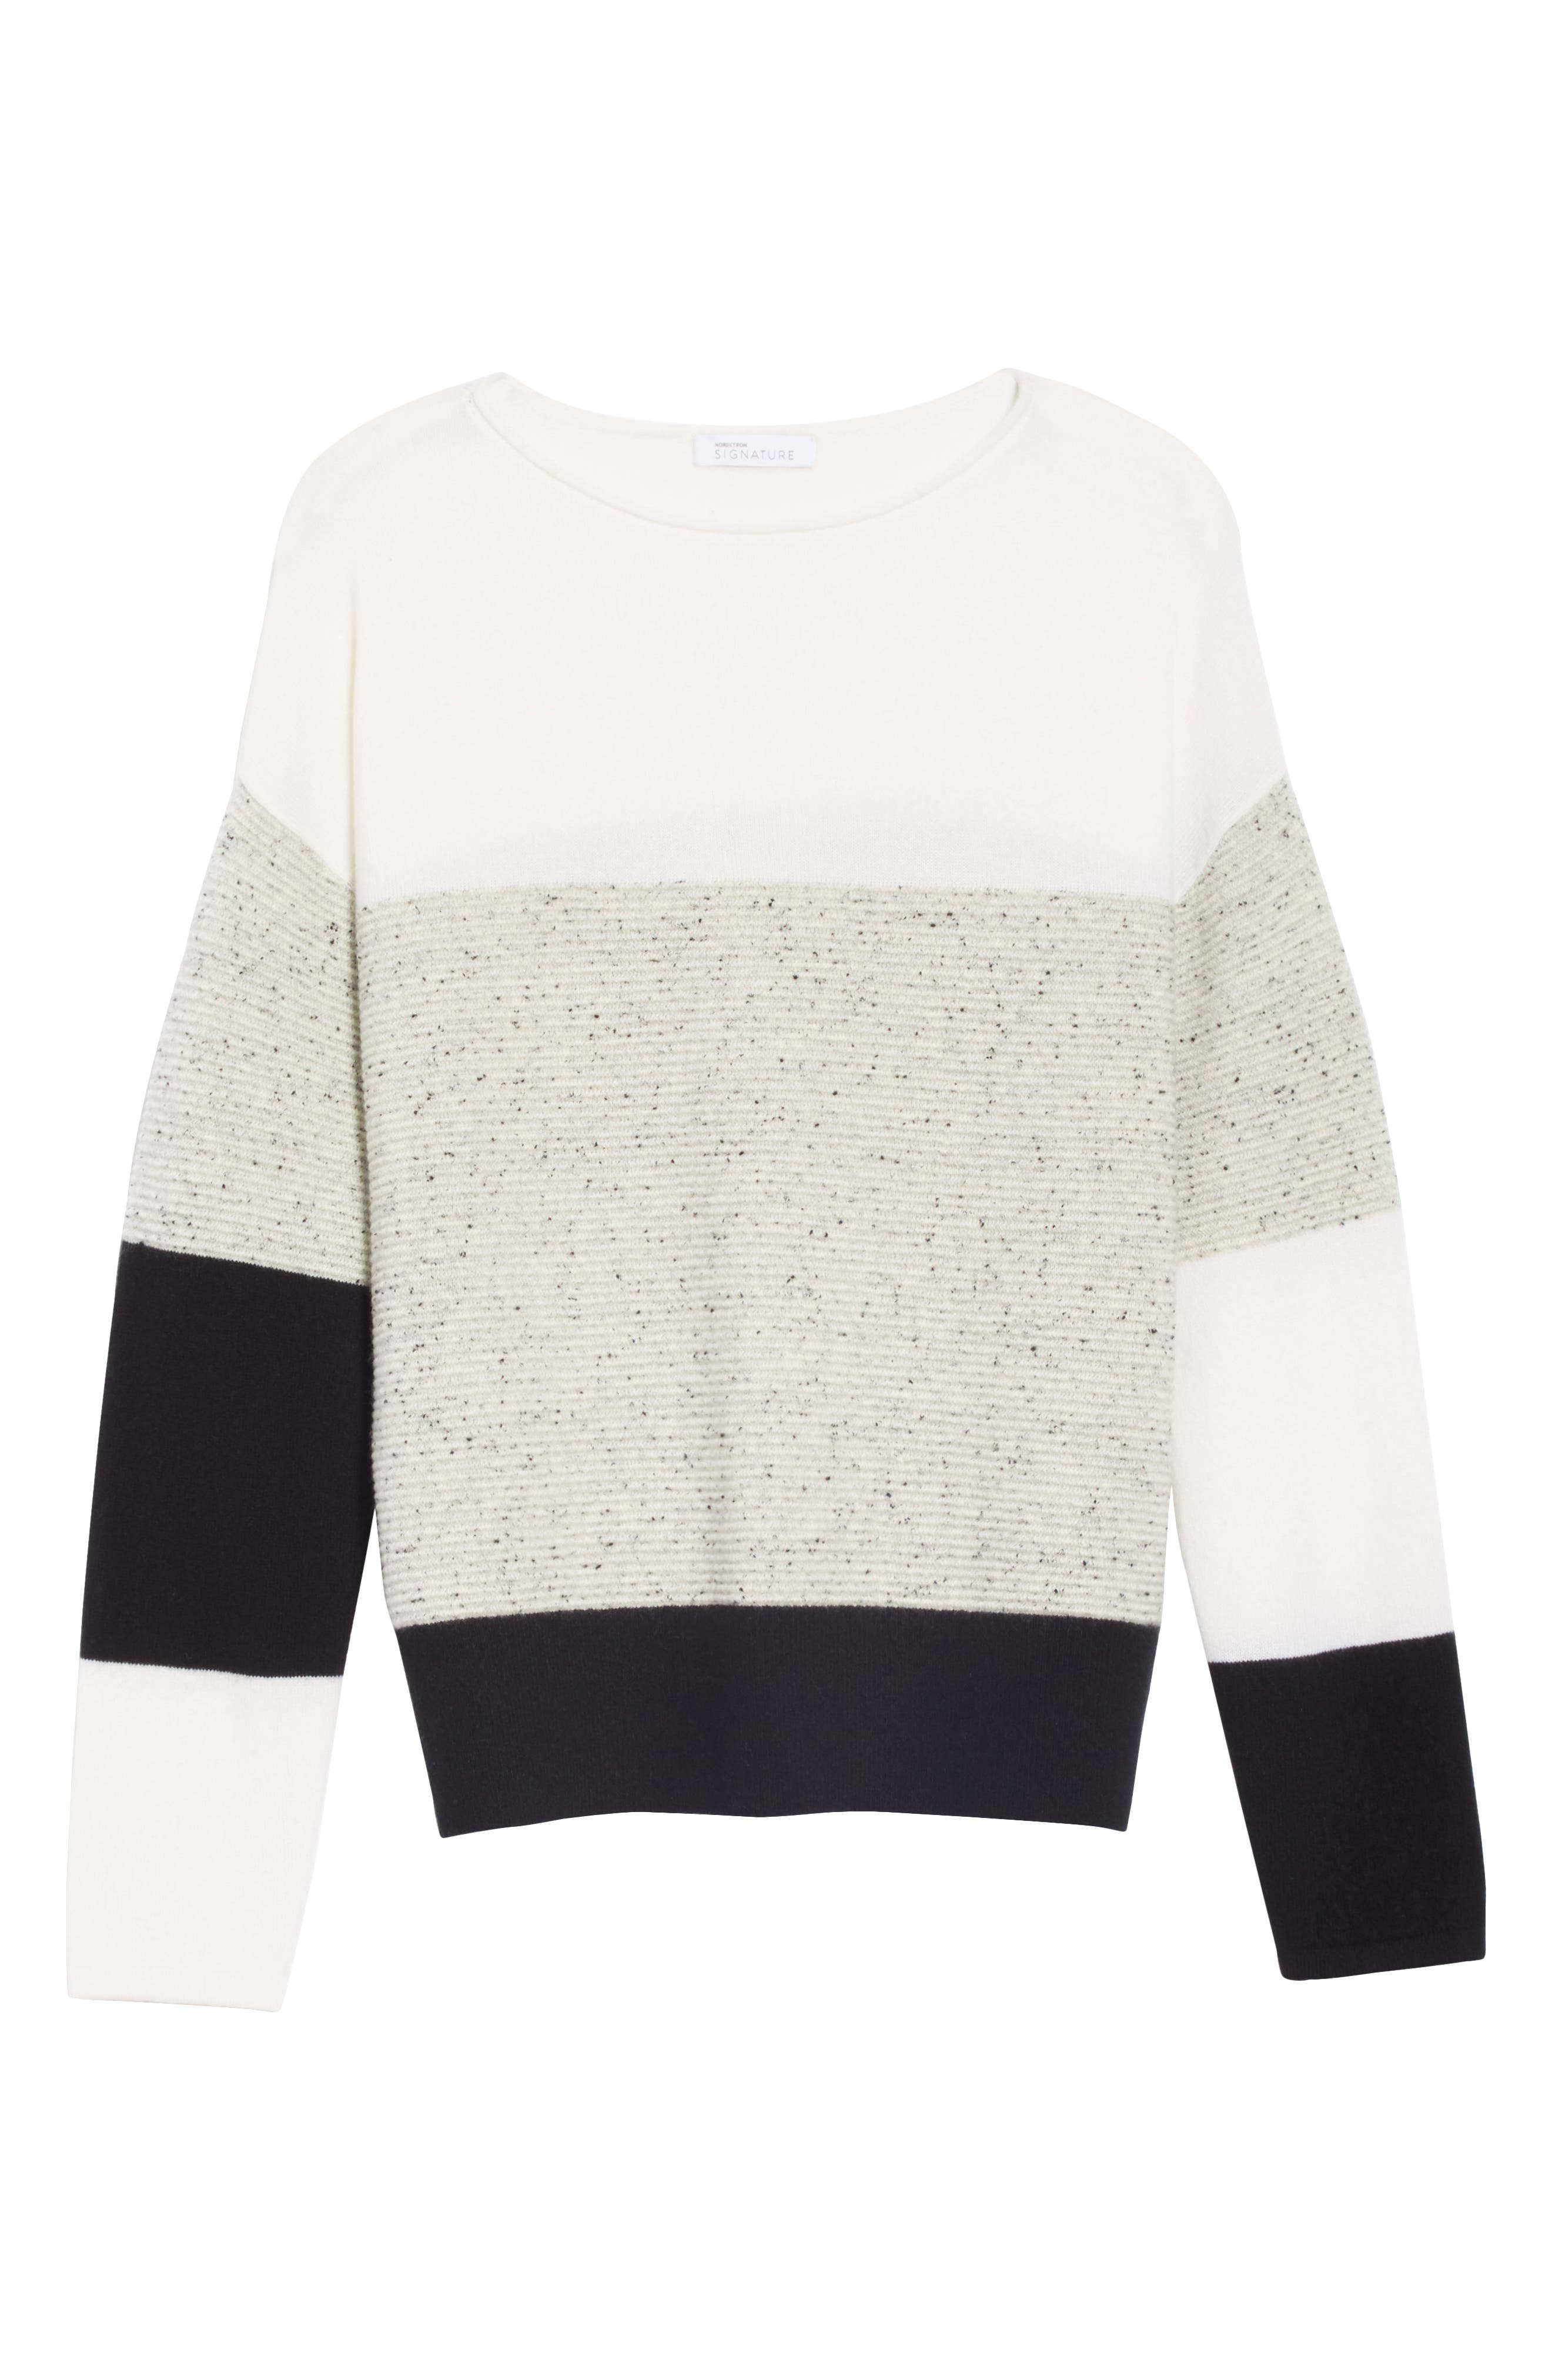 Colorblock Cashmere Sweater,                             Alternate thumbnail 6, color,                             IVORY SOFT MULTI COLOR BLOCK